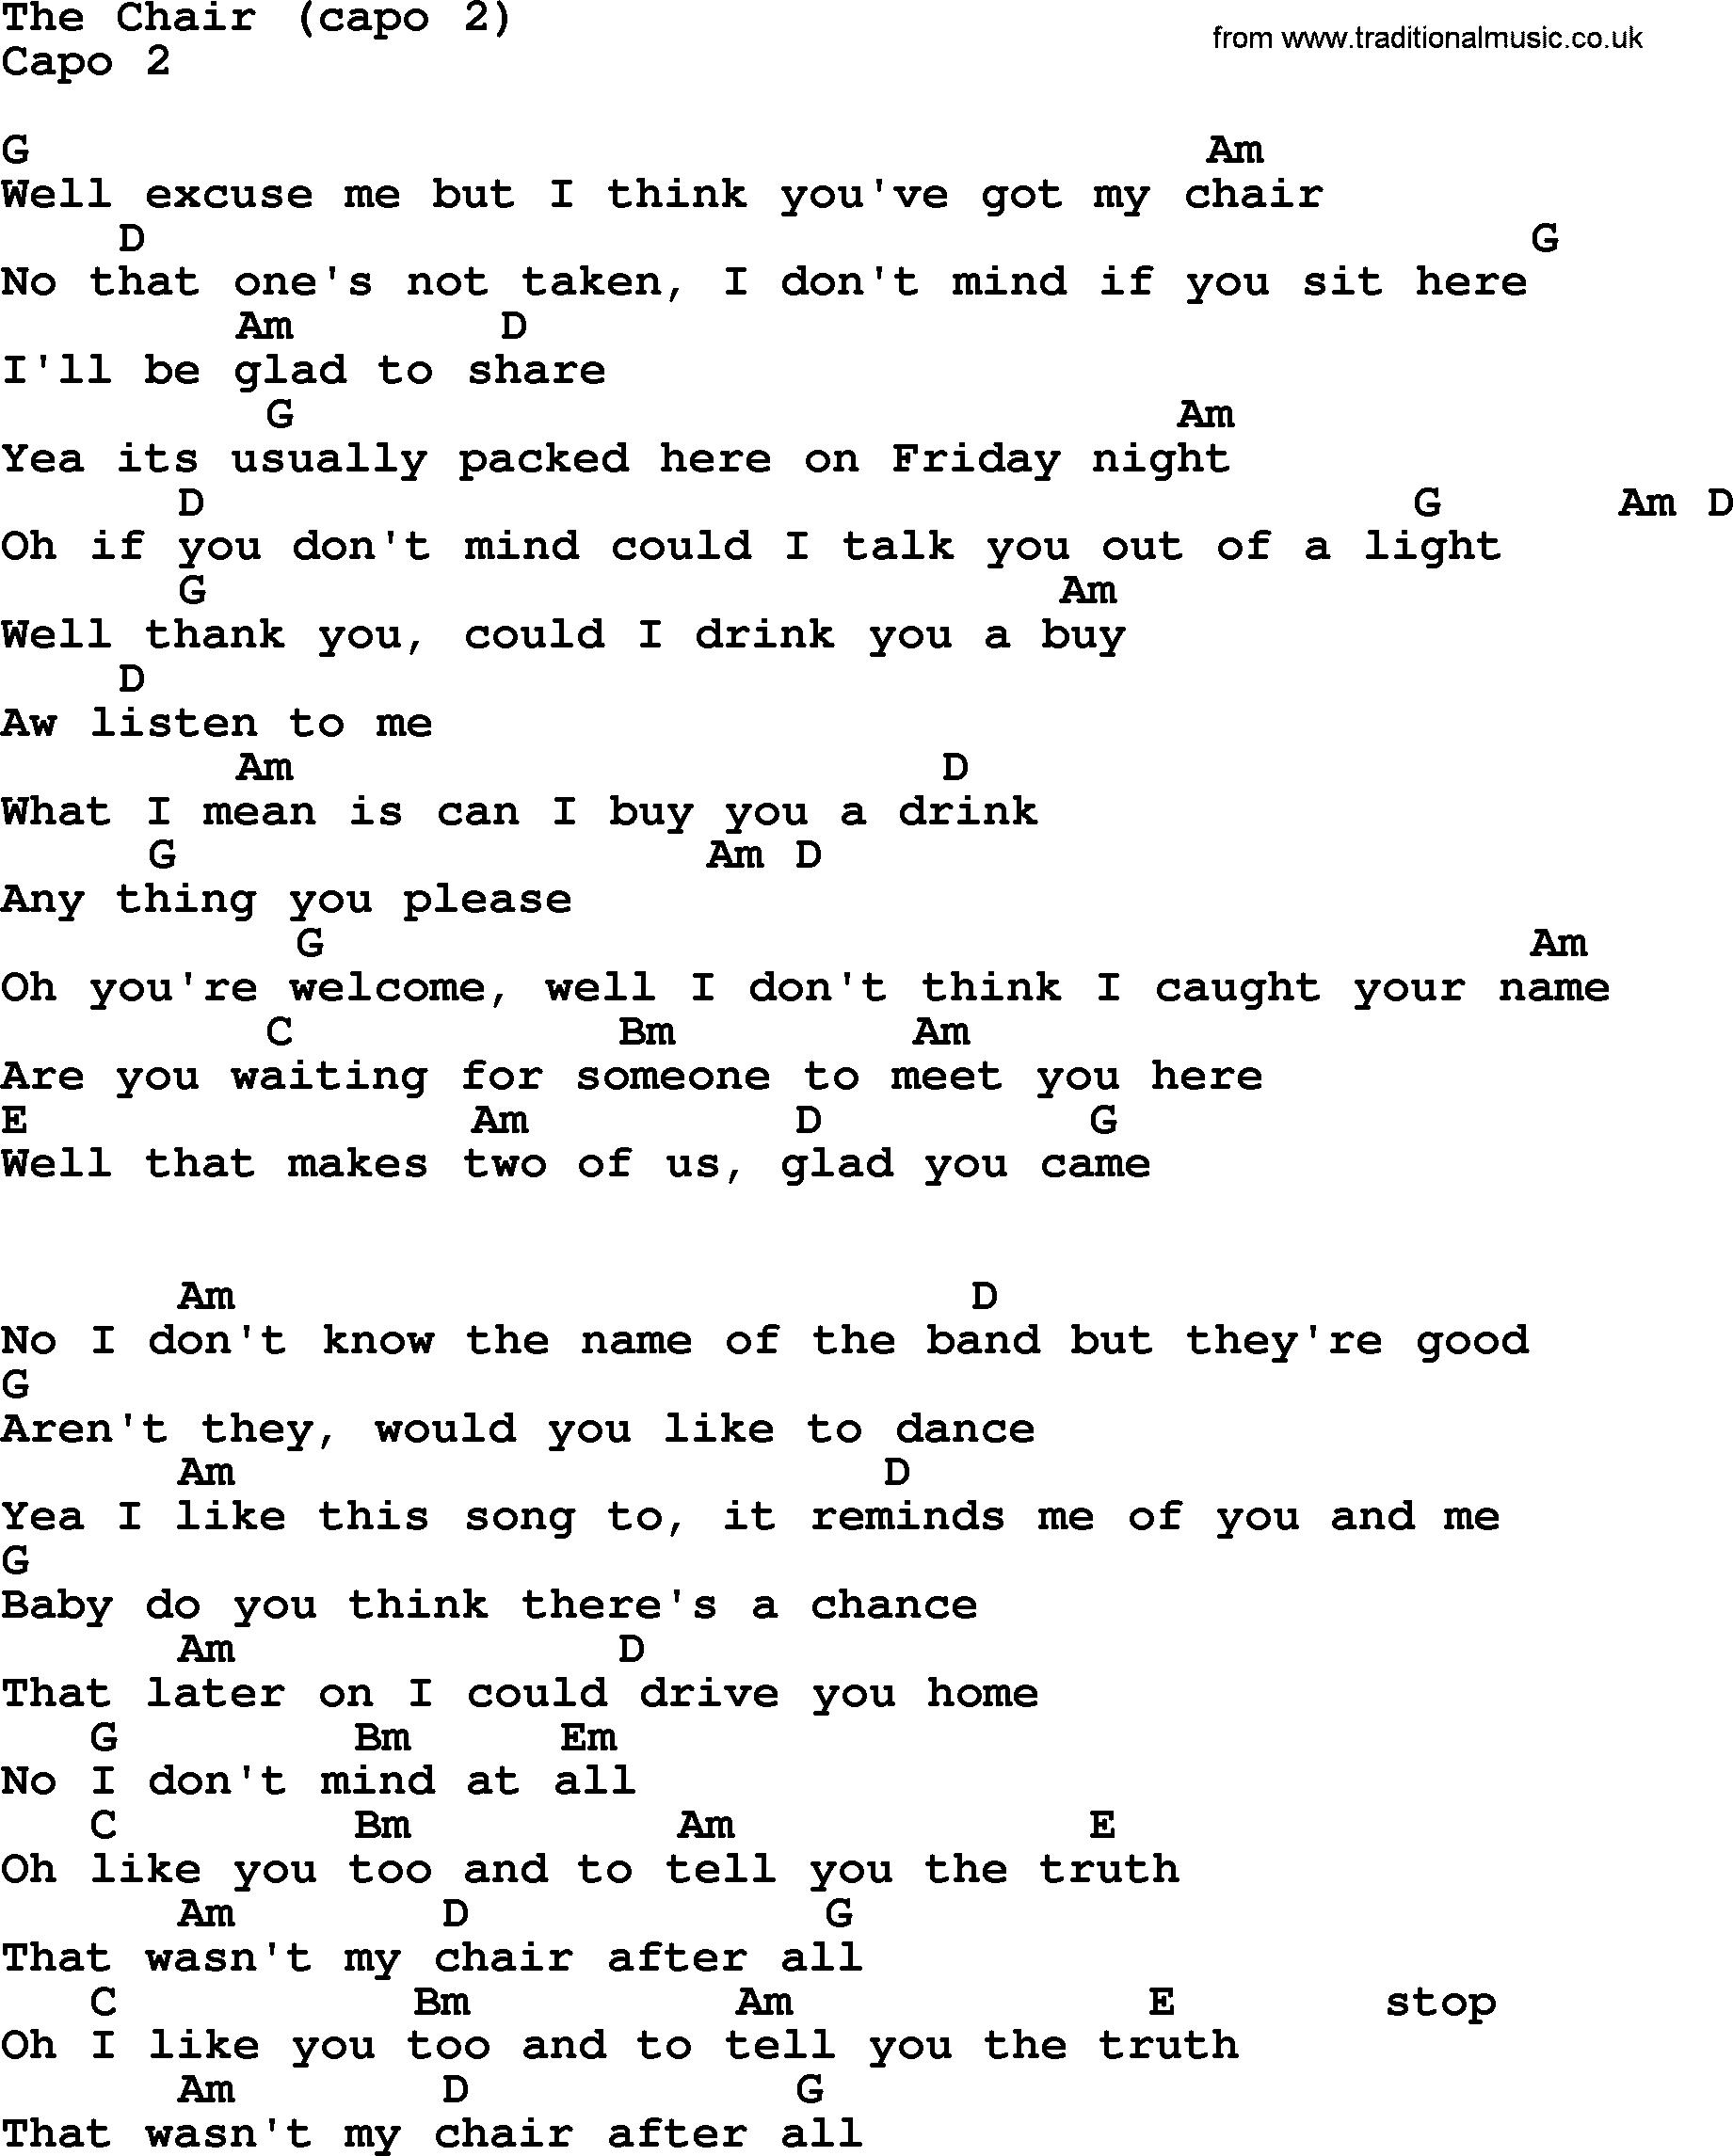 George Strait Song The Chair Capo 2 Lyrics And Chords Ukulele